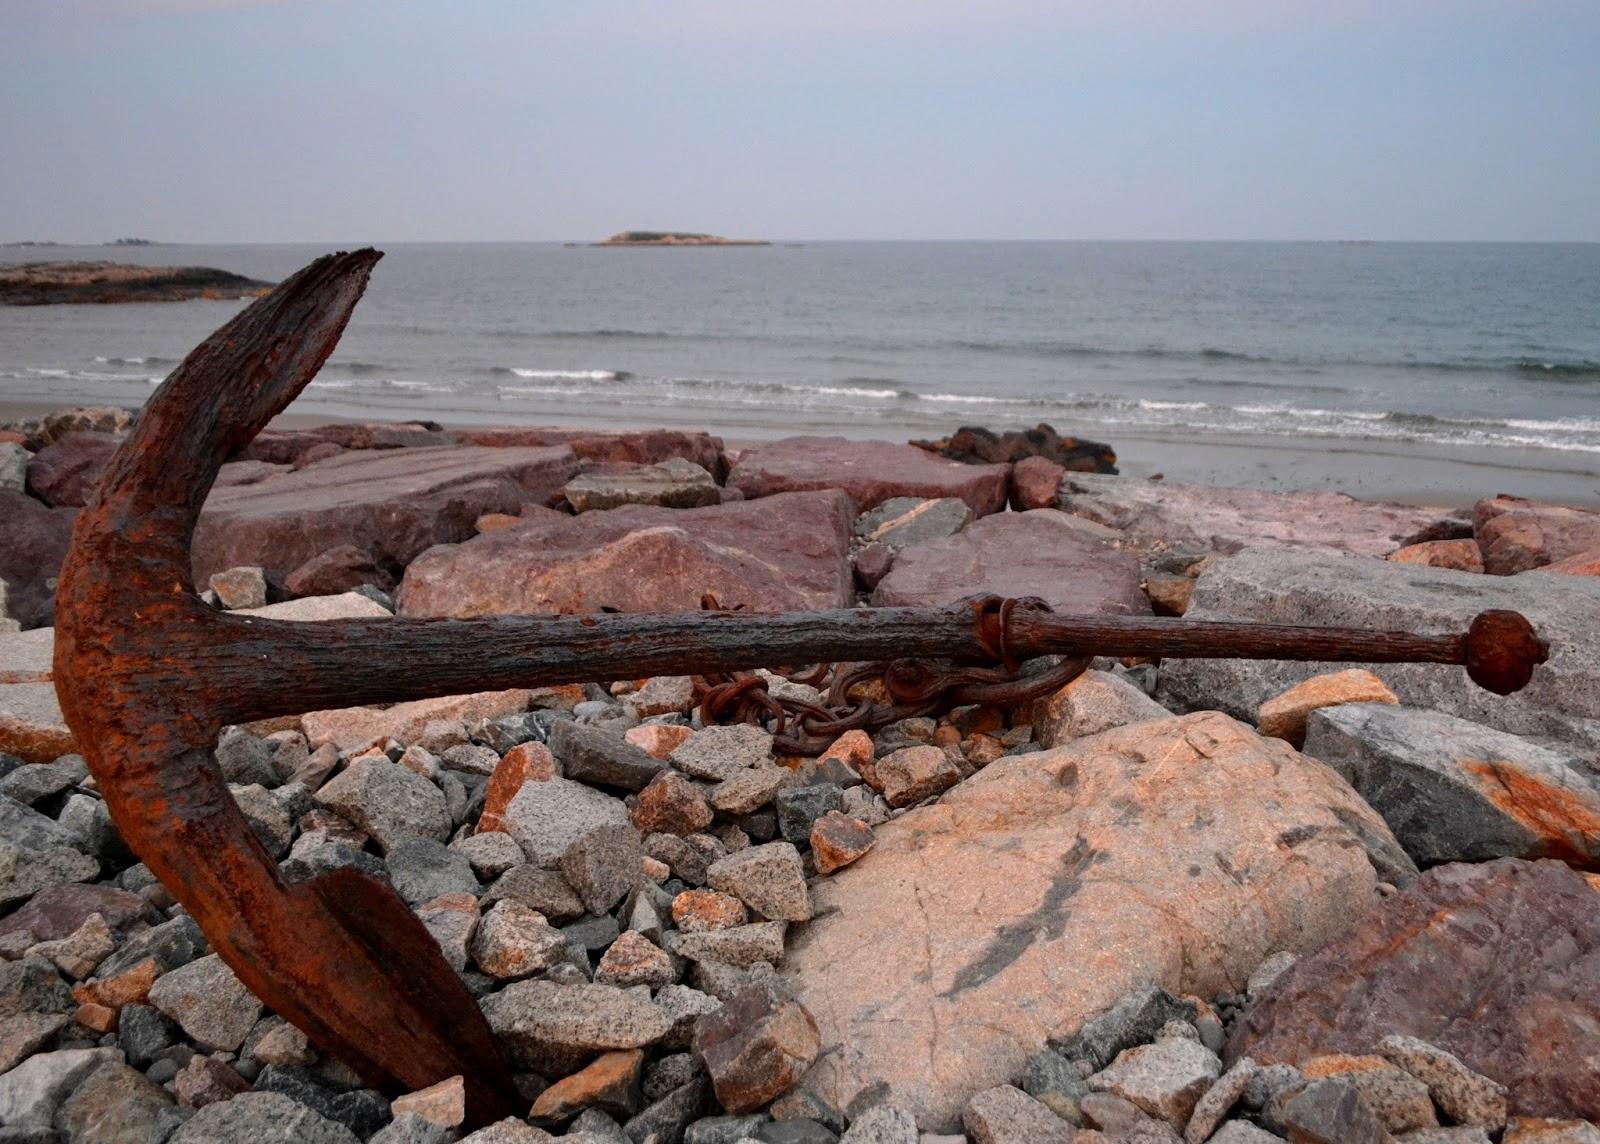 rusty, anchor, broken, beach, stones, rocks, ocean, island